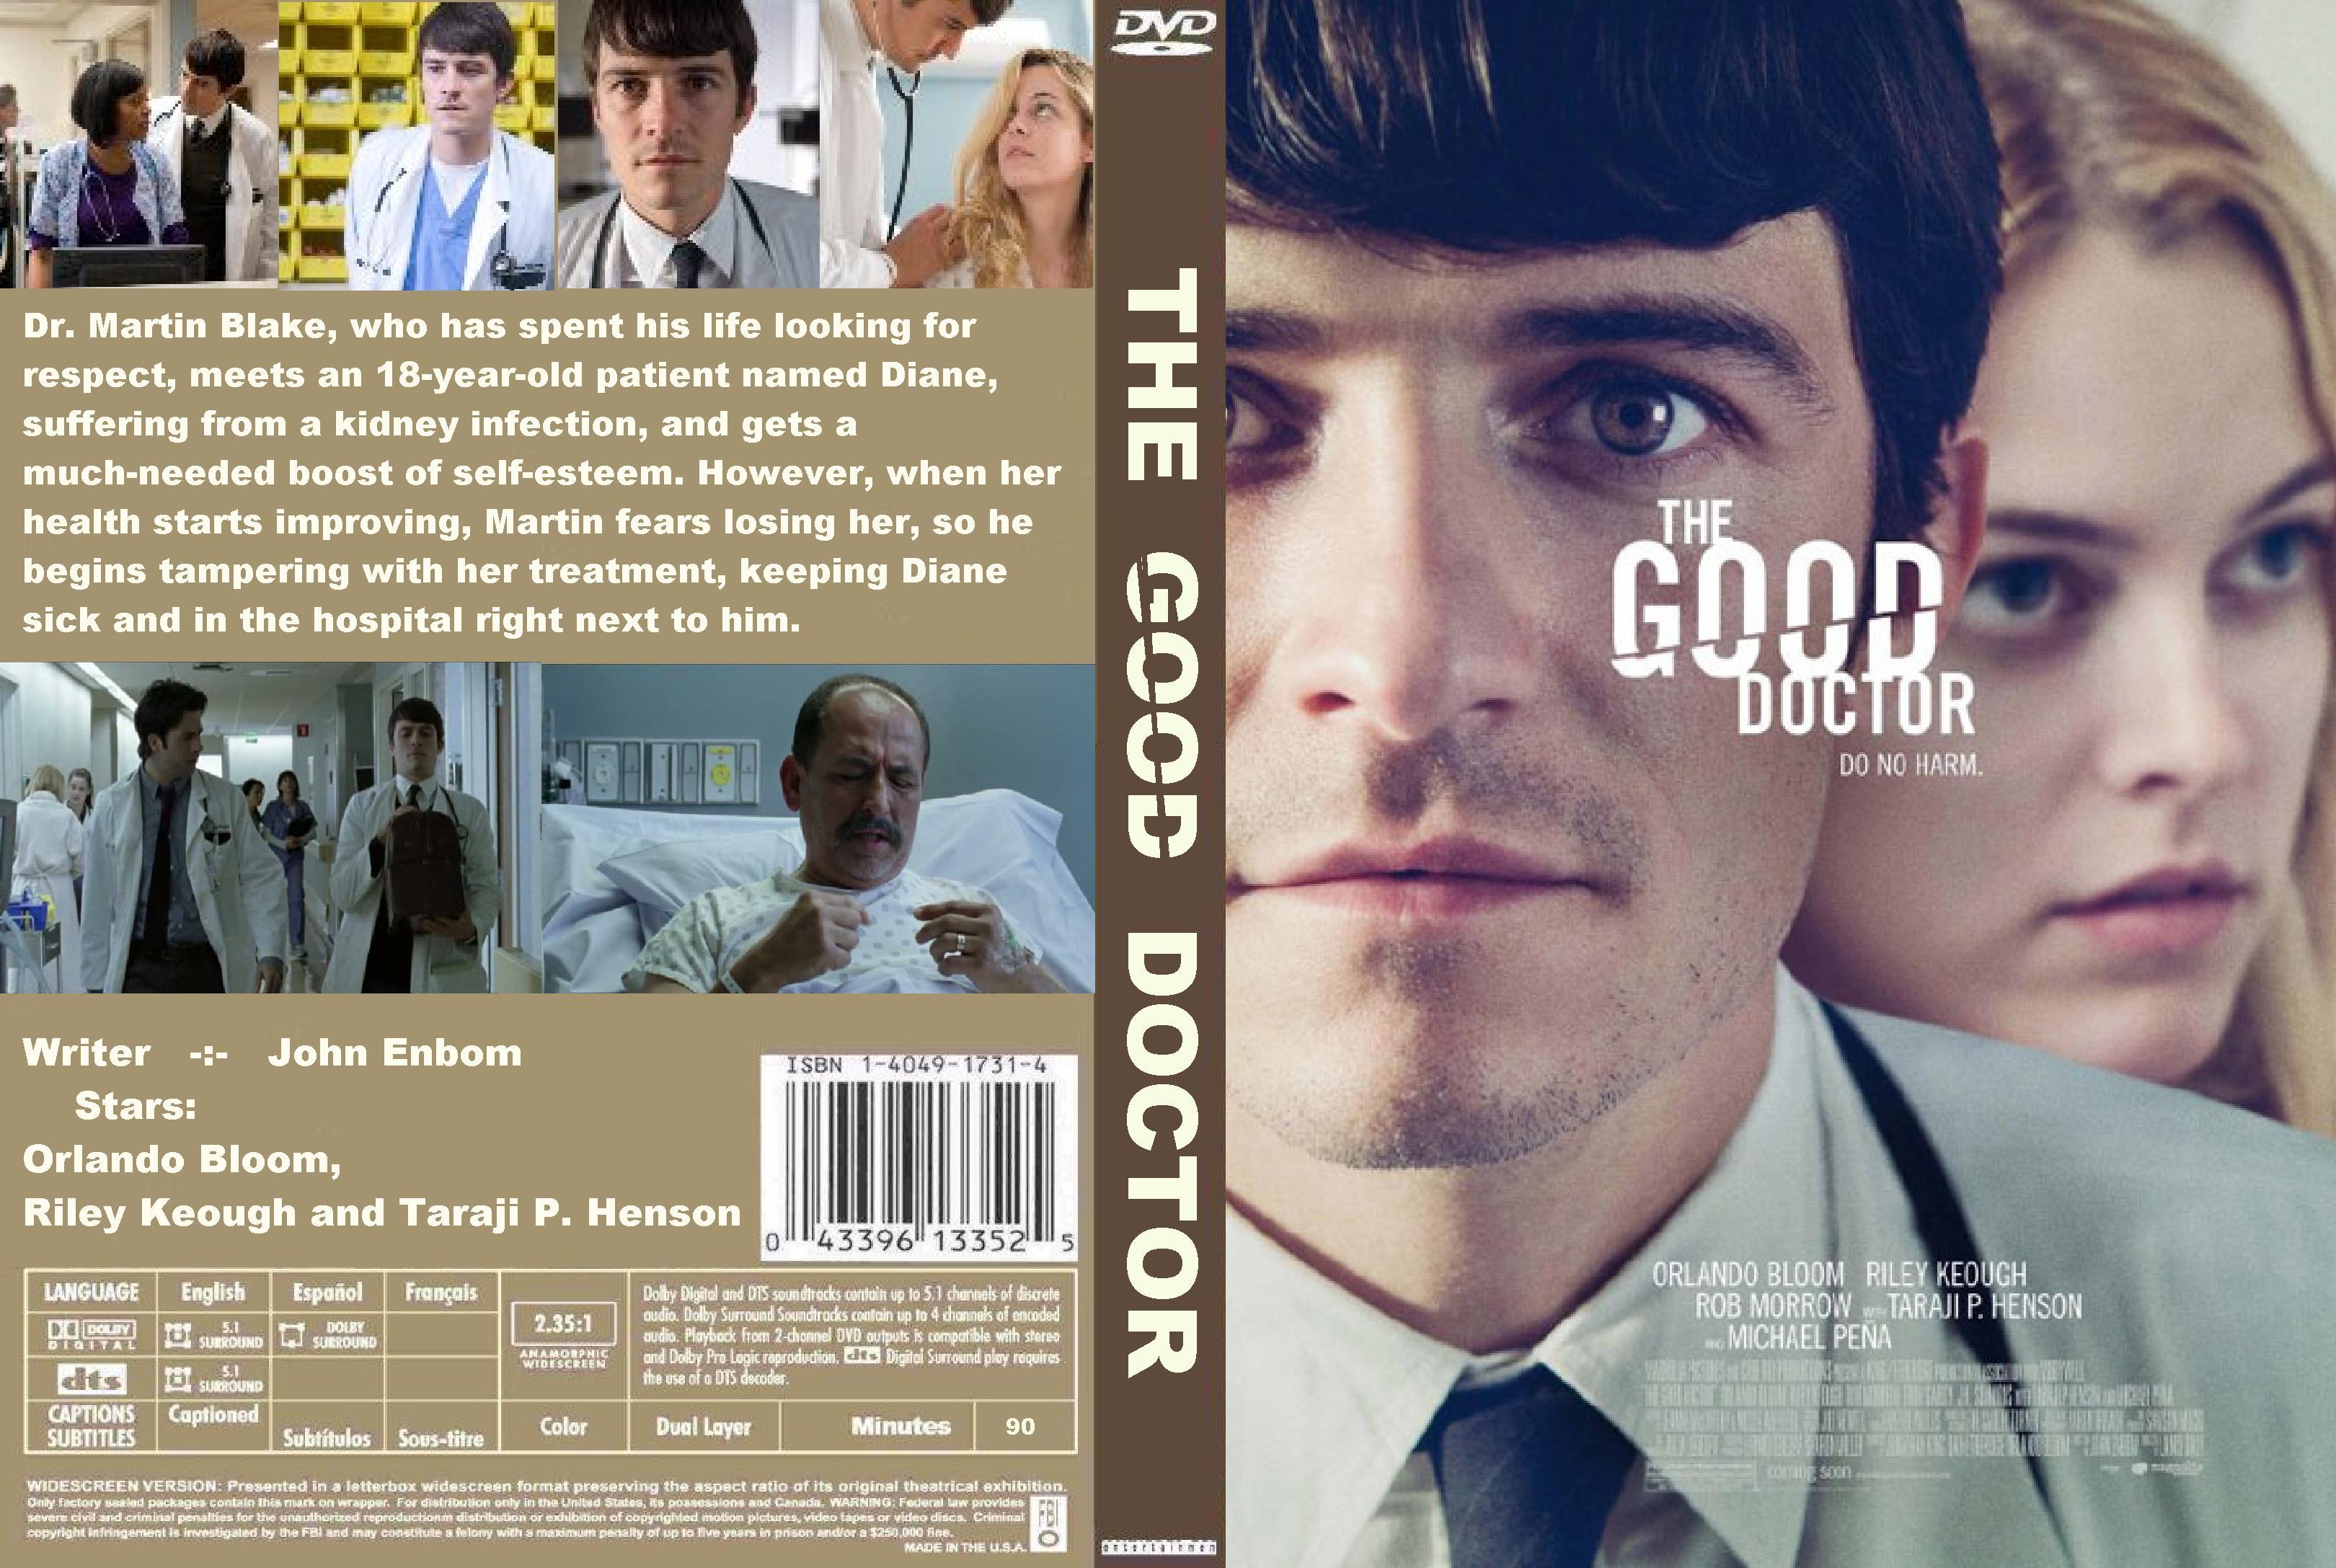 covers box sk good doctor 2011 imdb dl high quality dvd